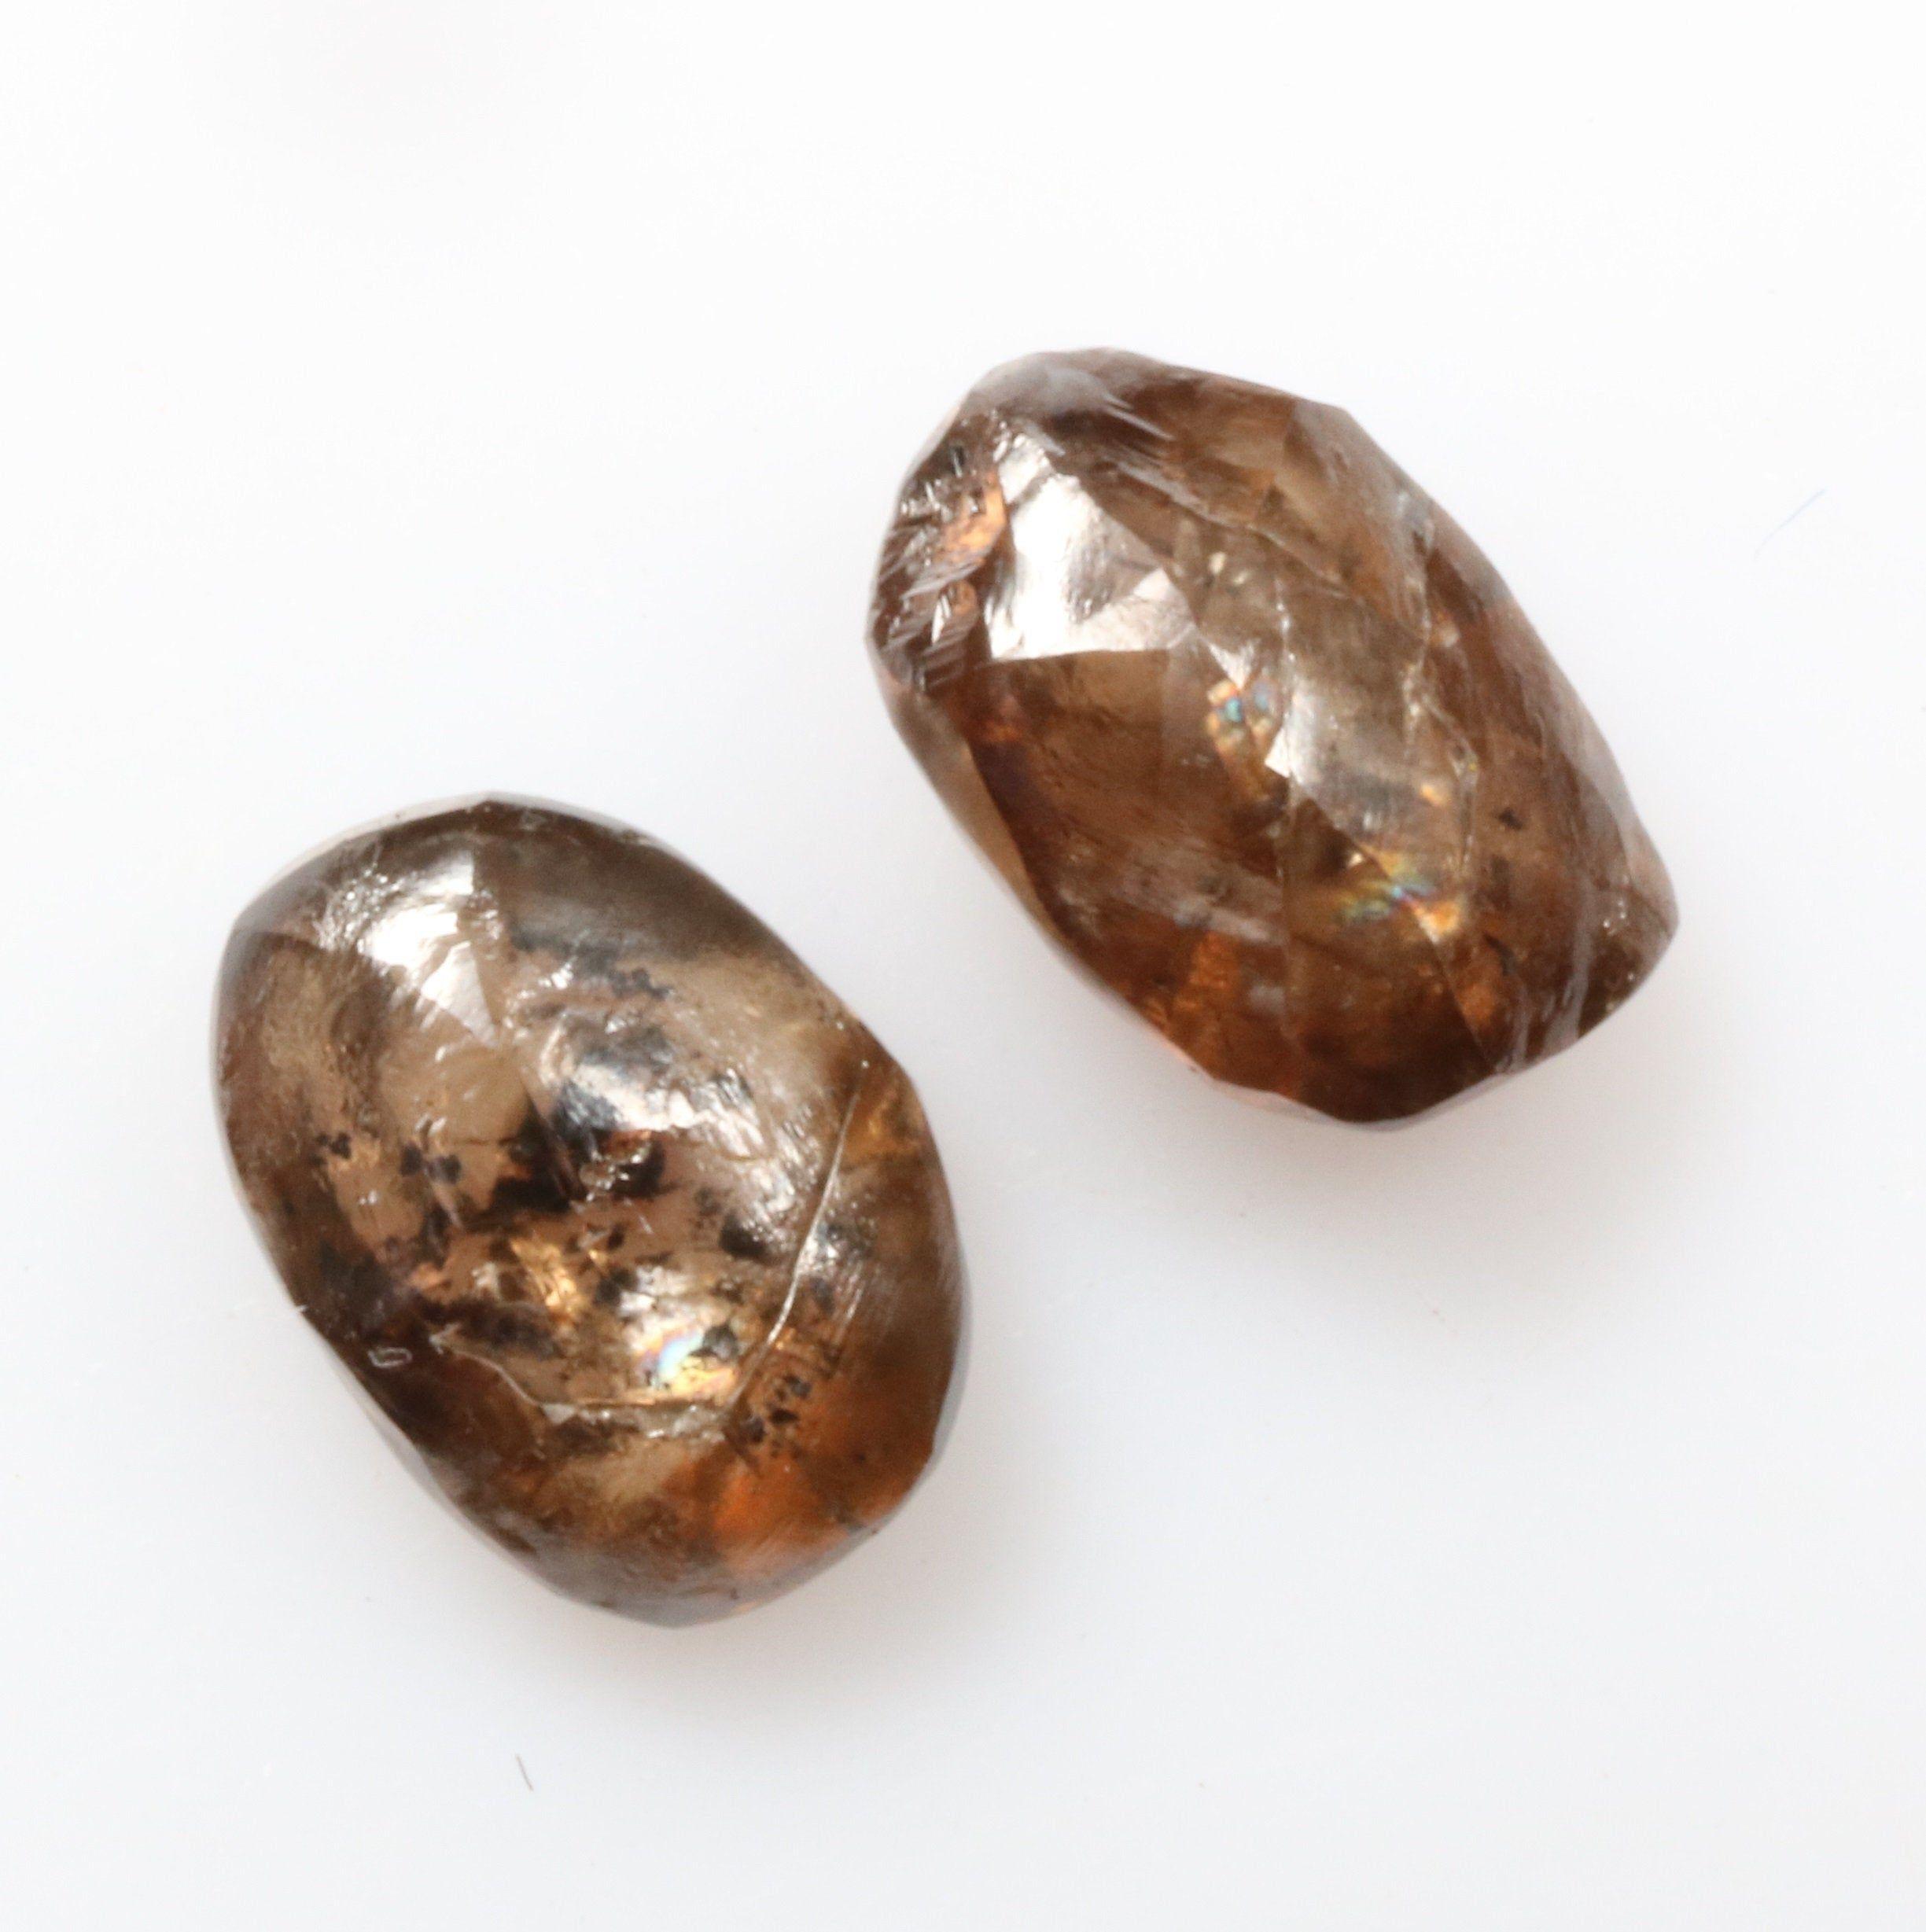 soil how to identify kimberlite